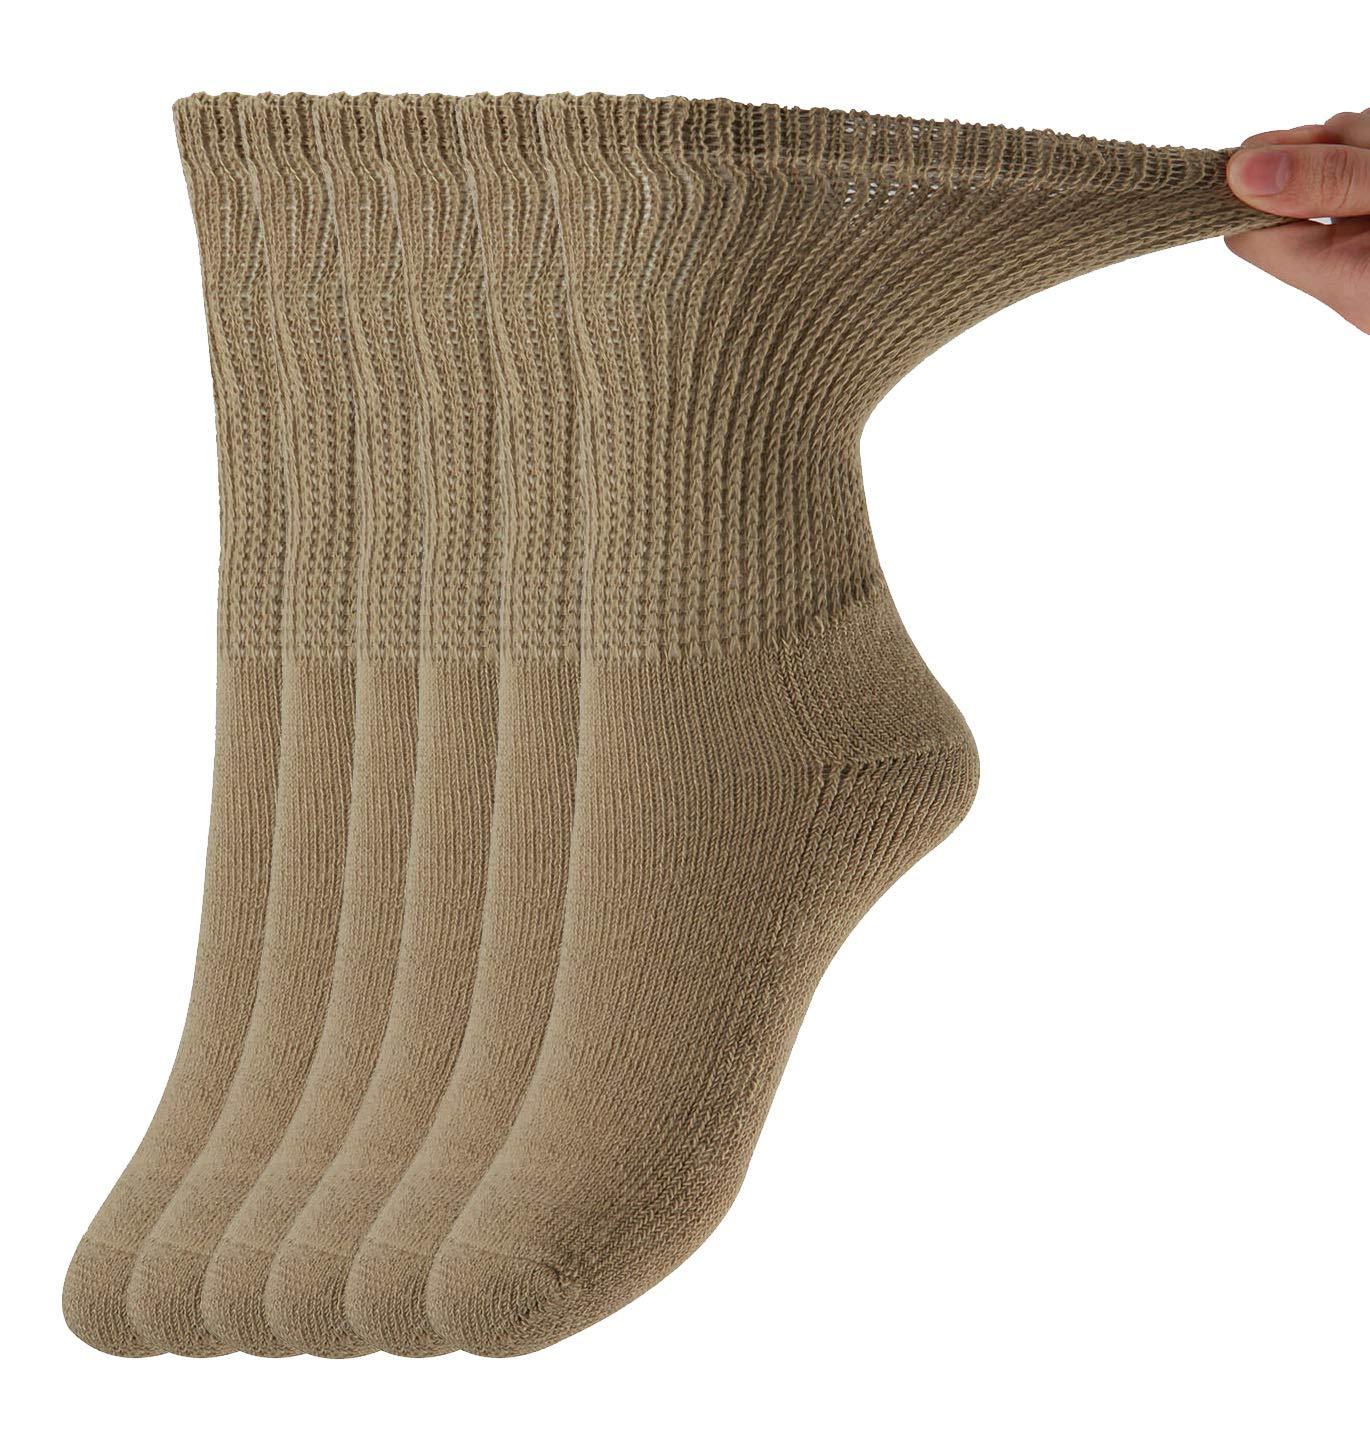 MD Diabetic Socks Mens and Womens Half Cushion Circulatory Crew Socks for All Seasons Loose Fit 6 Pack 10-13 Brown